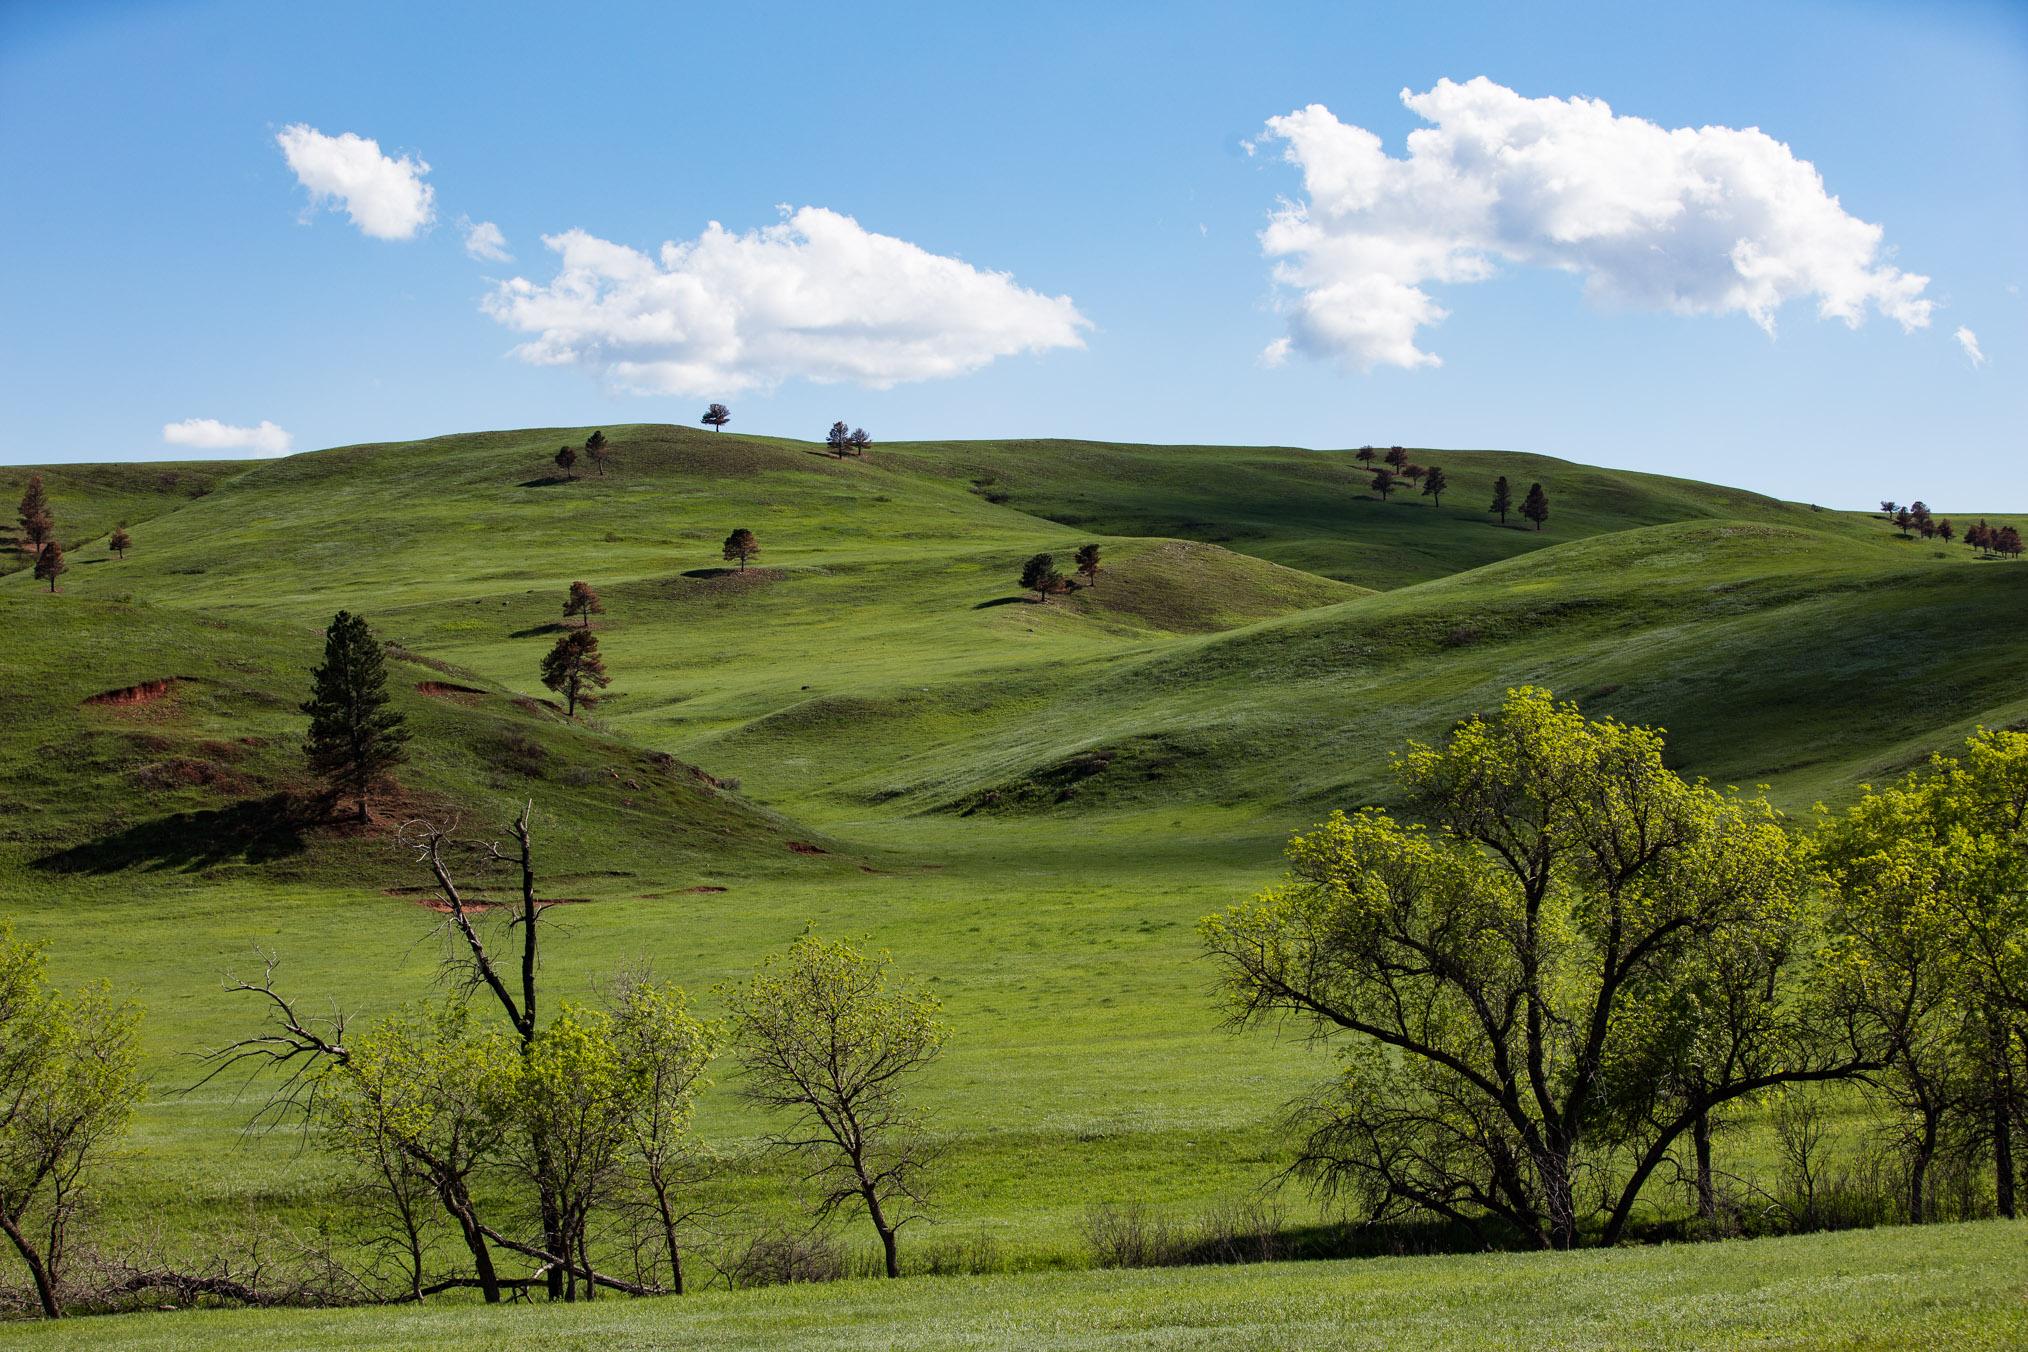 custer state park.jpg